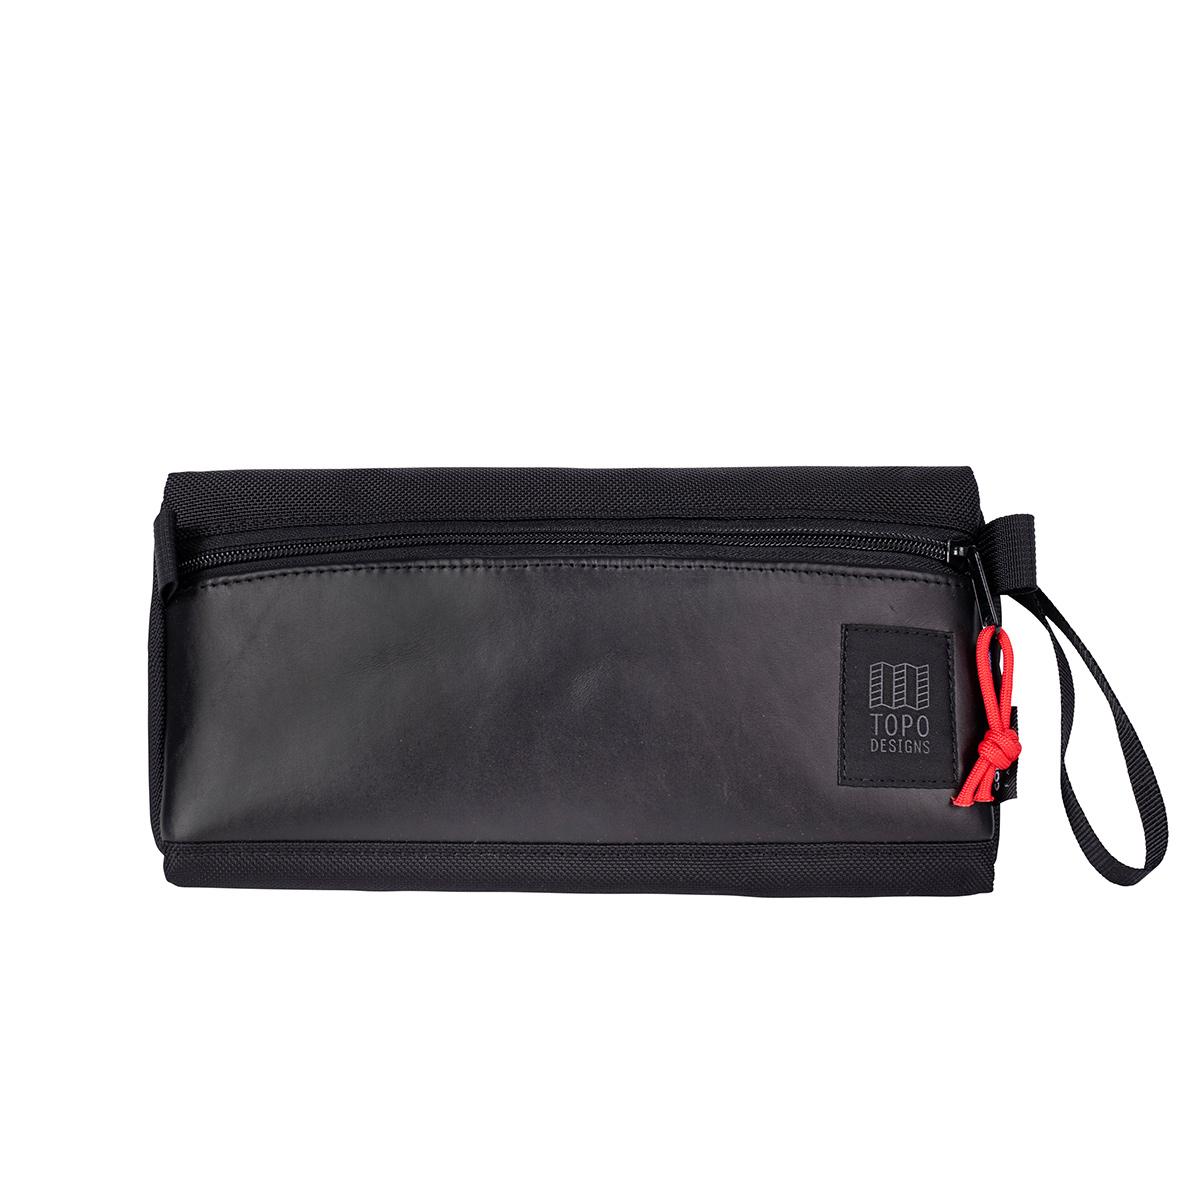 Topo Designs Dopp Kit Ballistic Black/Black Leather, water-resistant, travel light, accessory bag